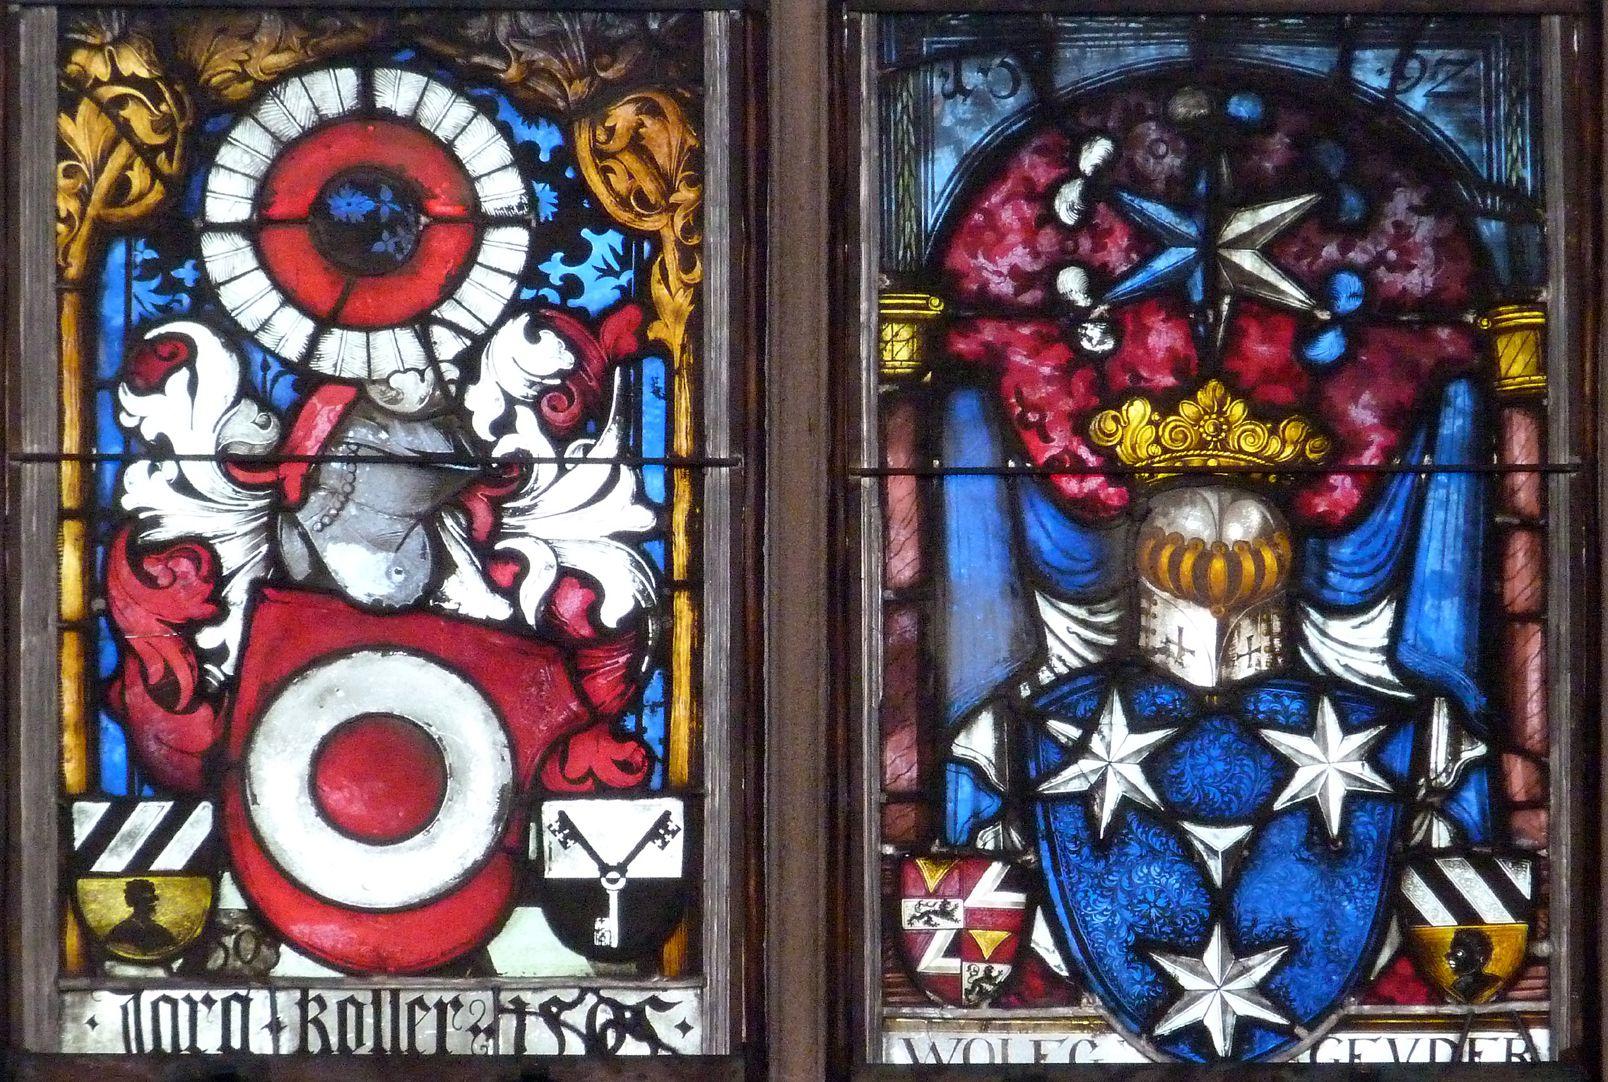 Hirschvogelfenster Mittelfeld: oberstes Band, Wappen Koler 1505 (links), Wappen Geuder von Heroldsberg 1592 (rechts)